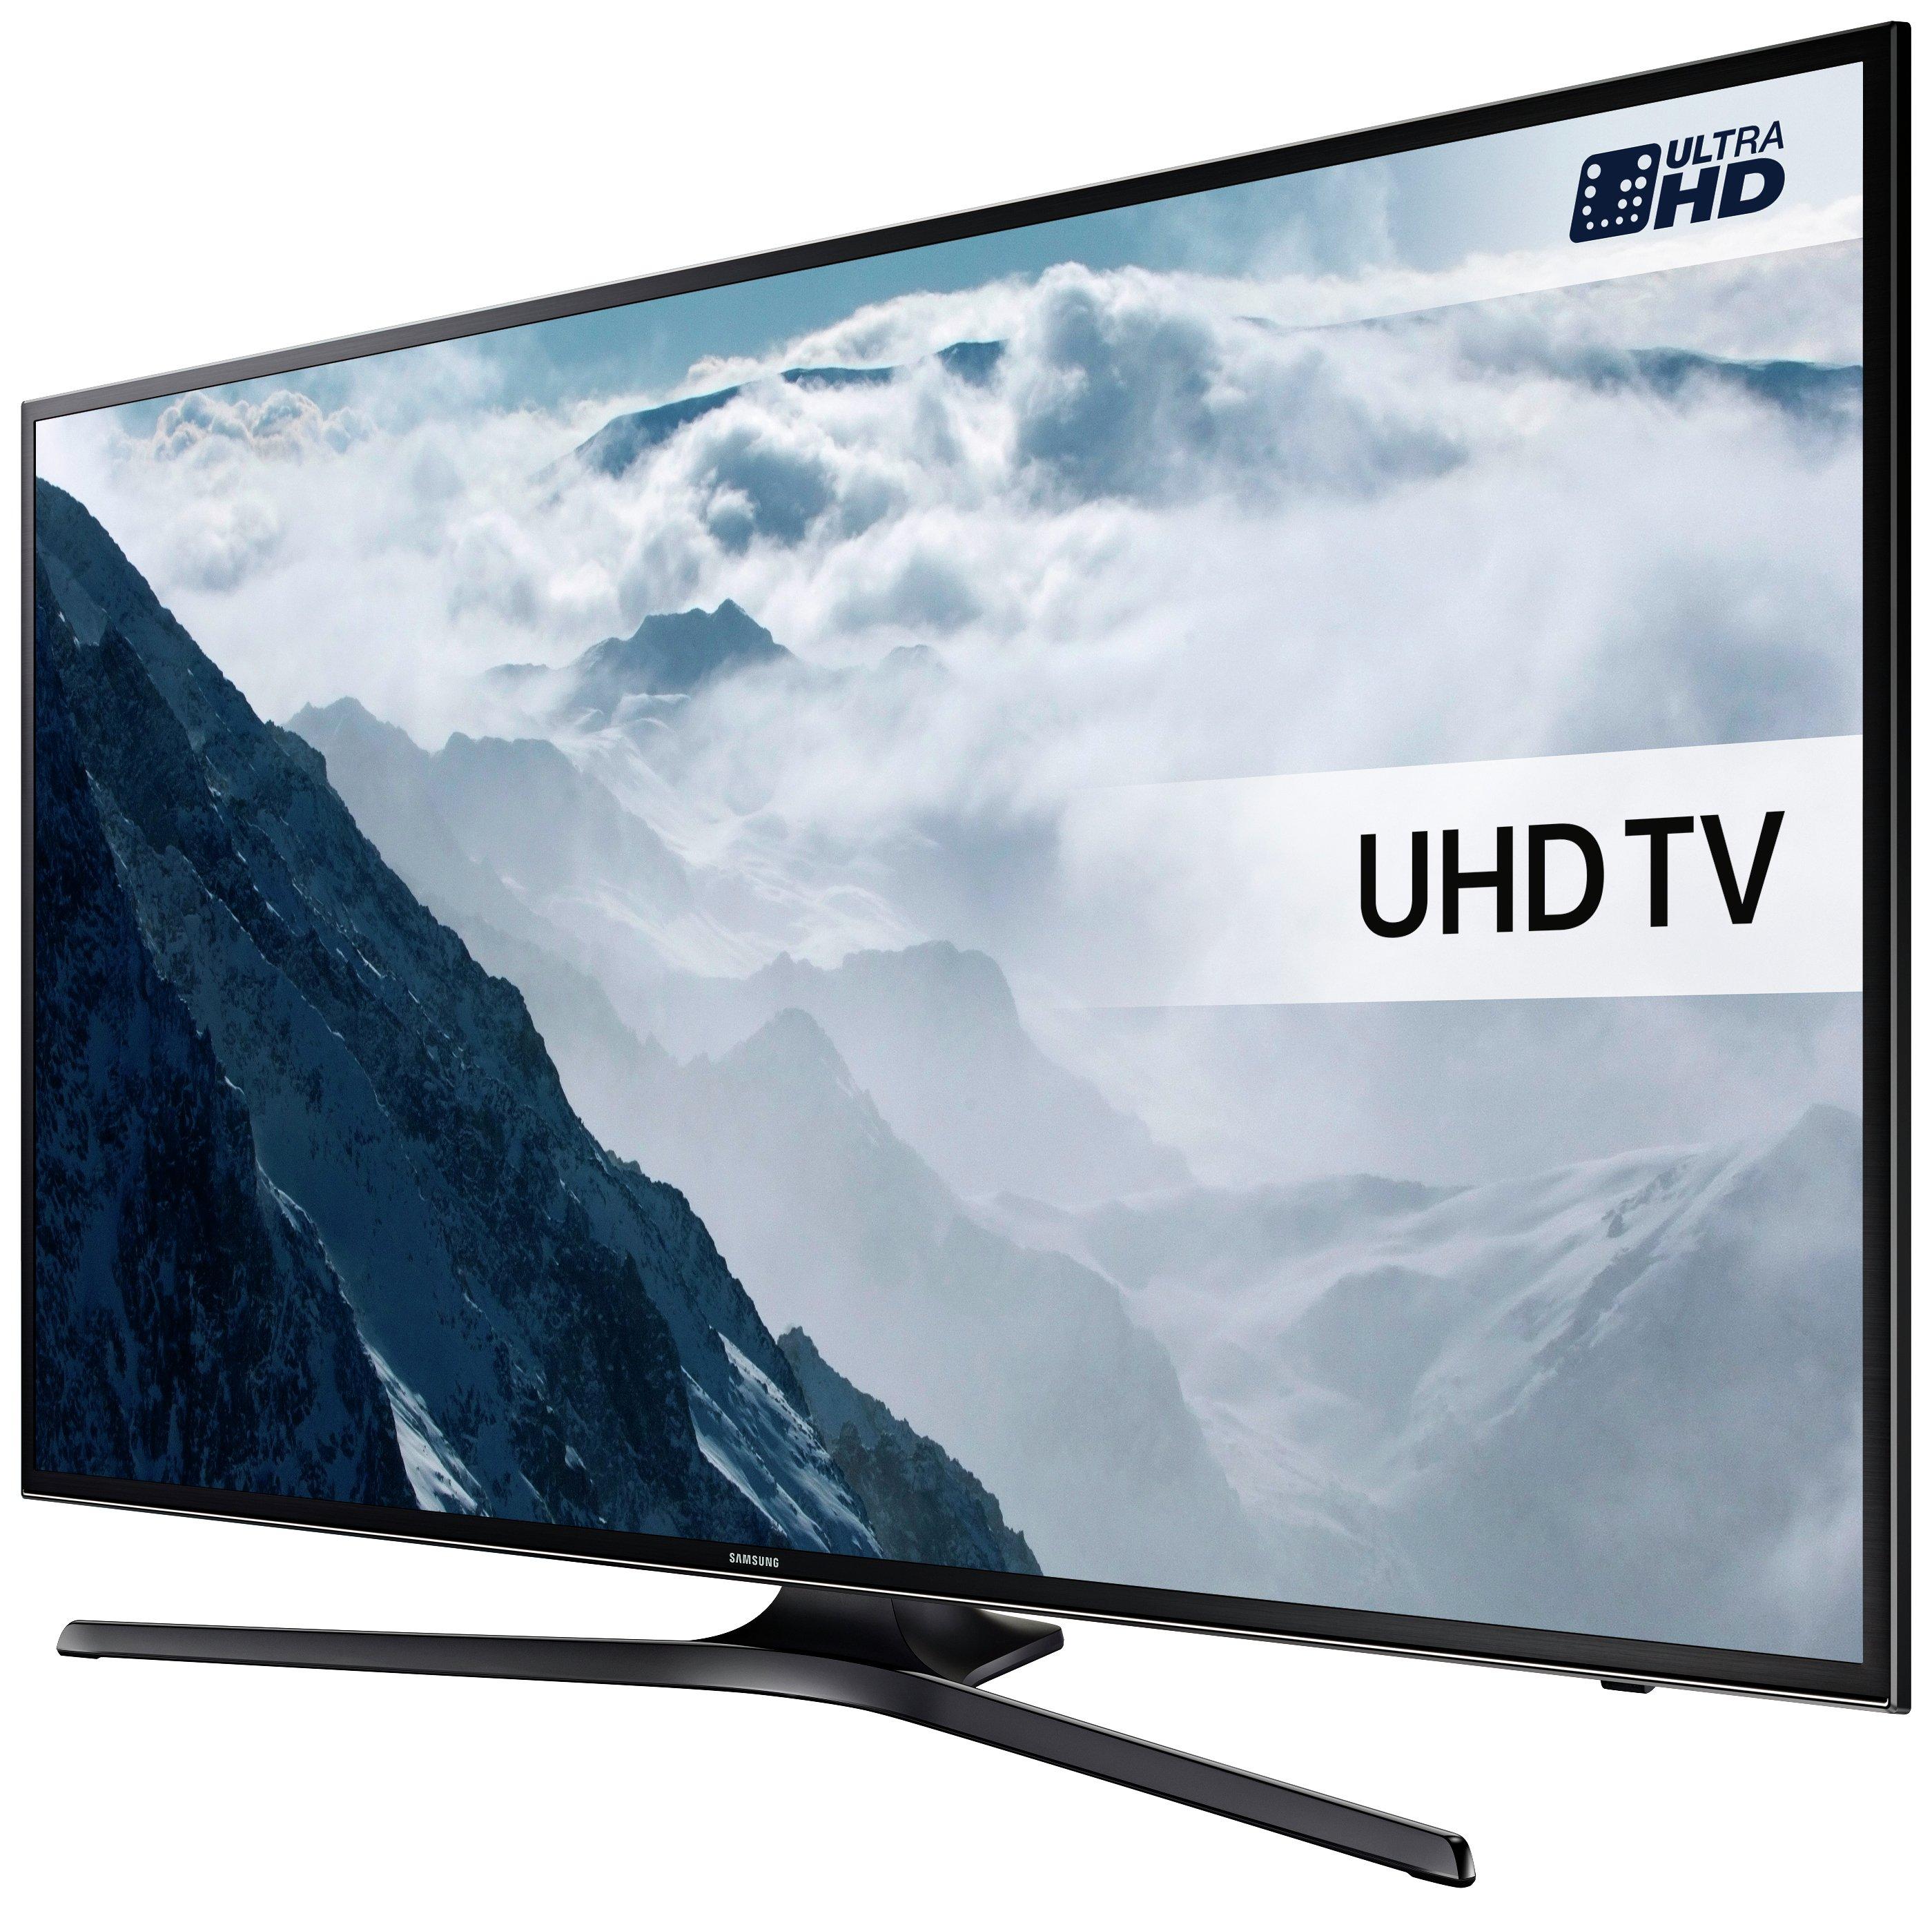 Samsung UE50KU6000 50 Inch UHD HDR Smart LED TV. - Black